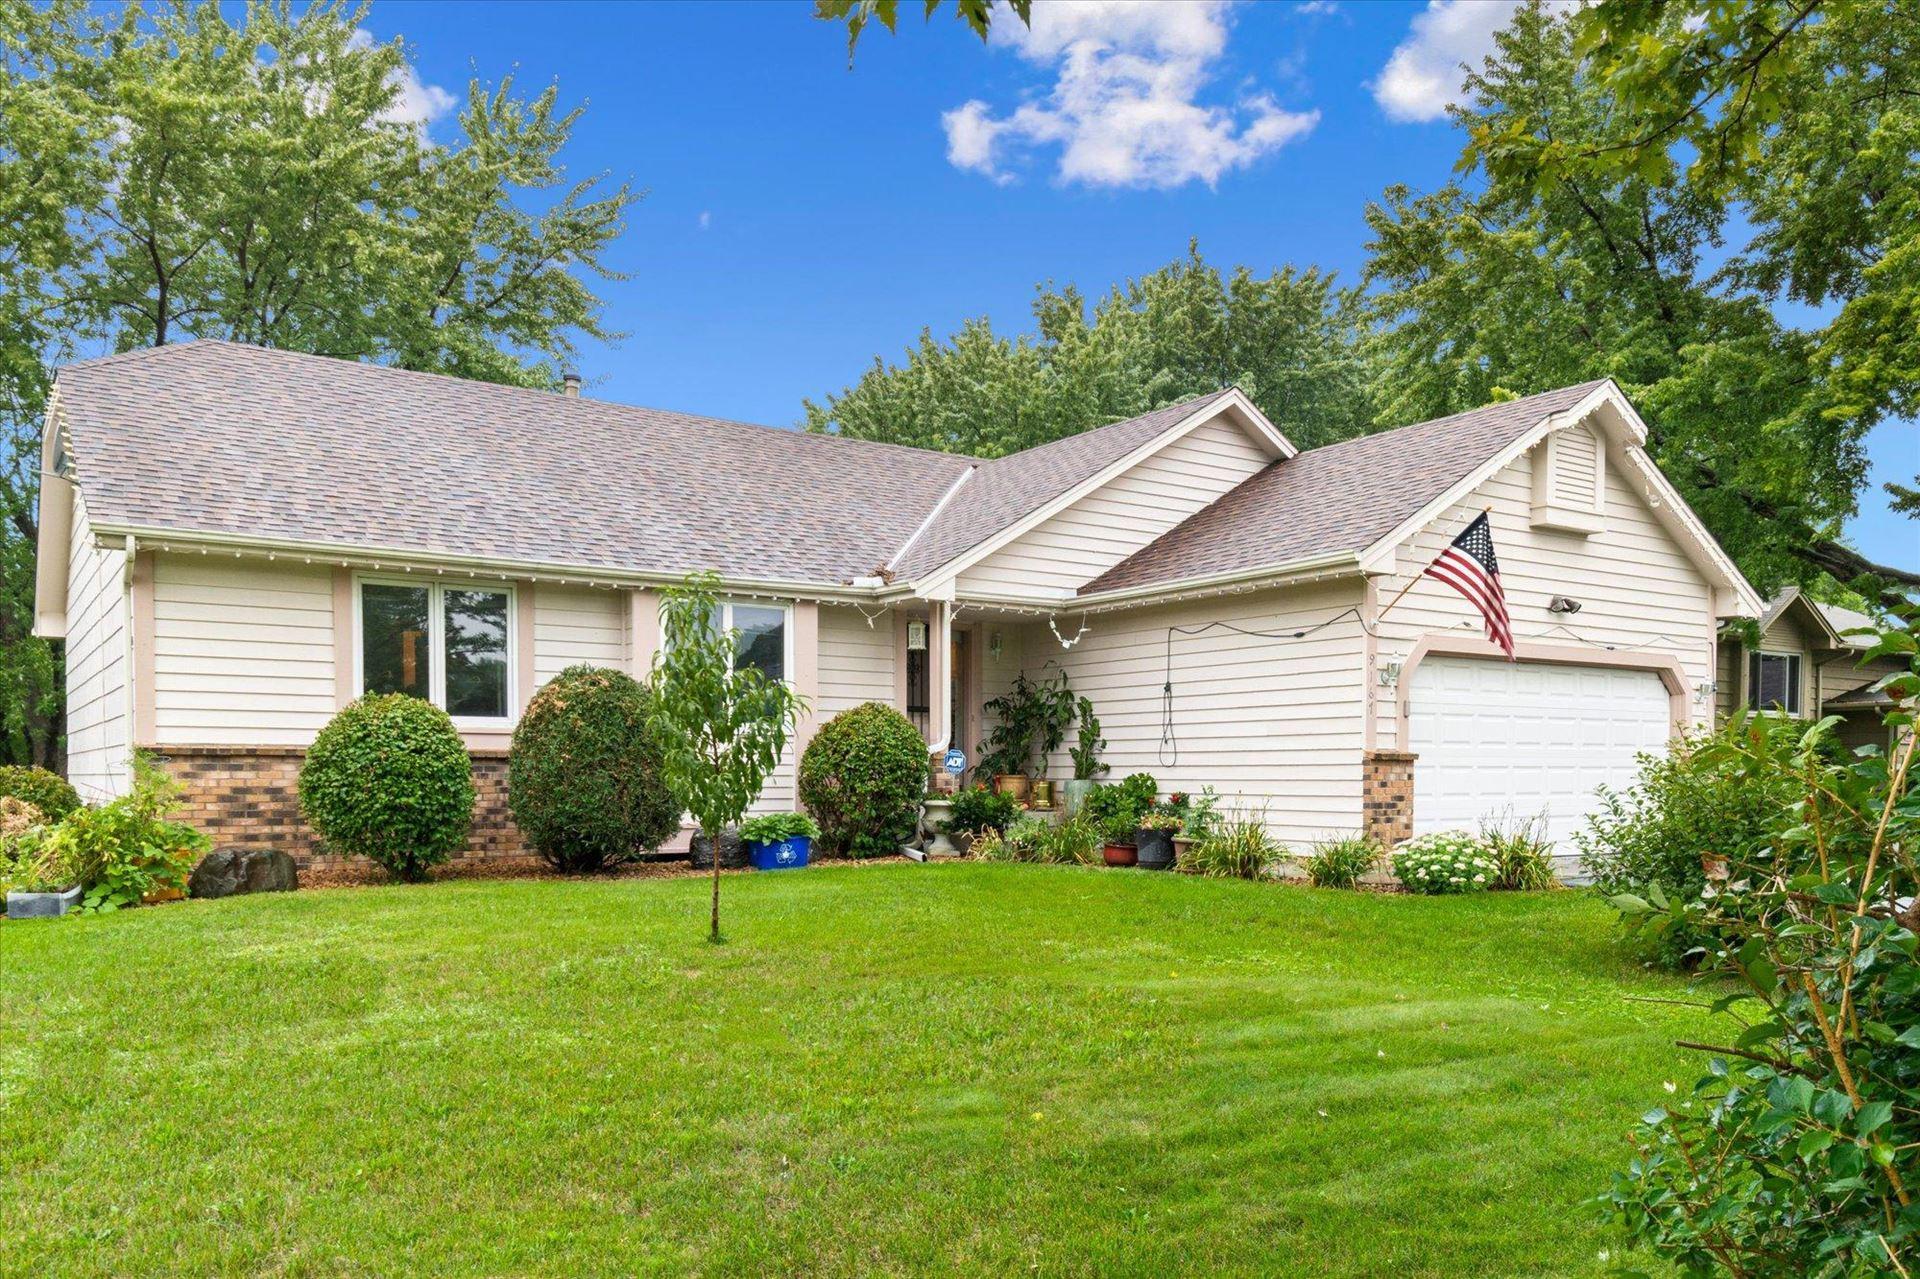 Photo of 9167 Pineview Lane N, Maple Grove, MN 55369 (MLS # 6105674)